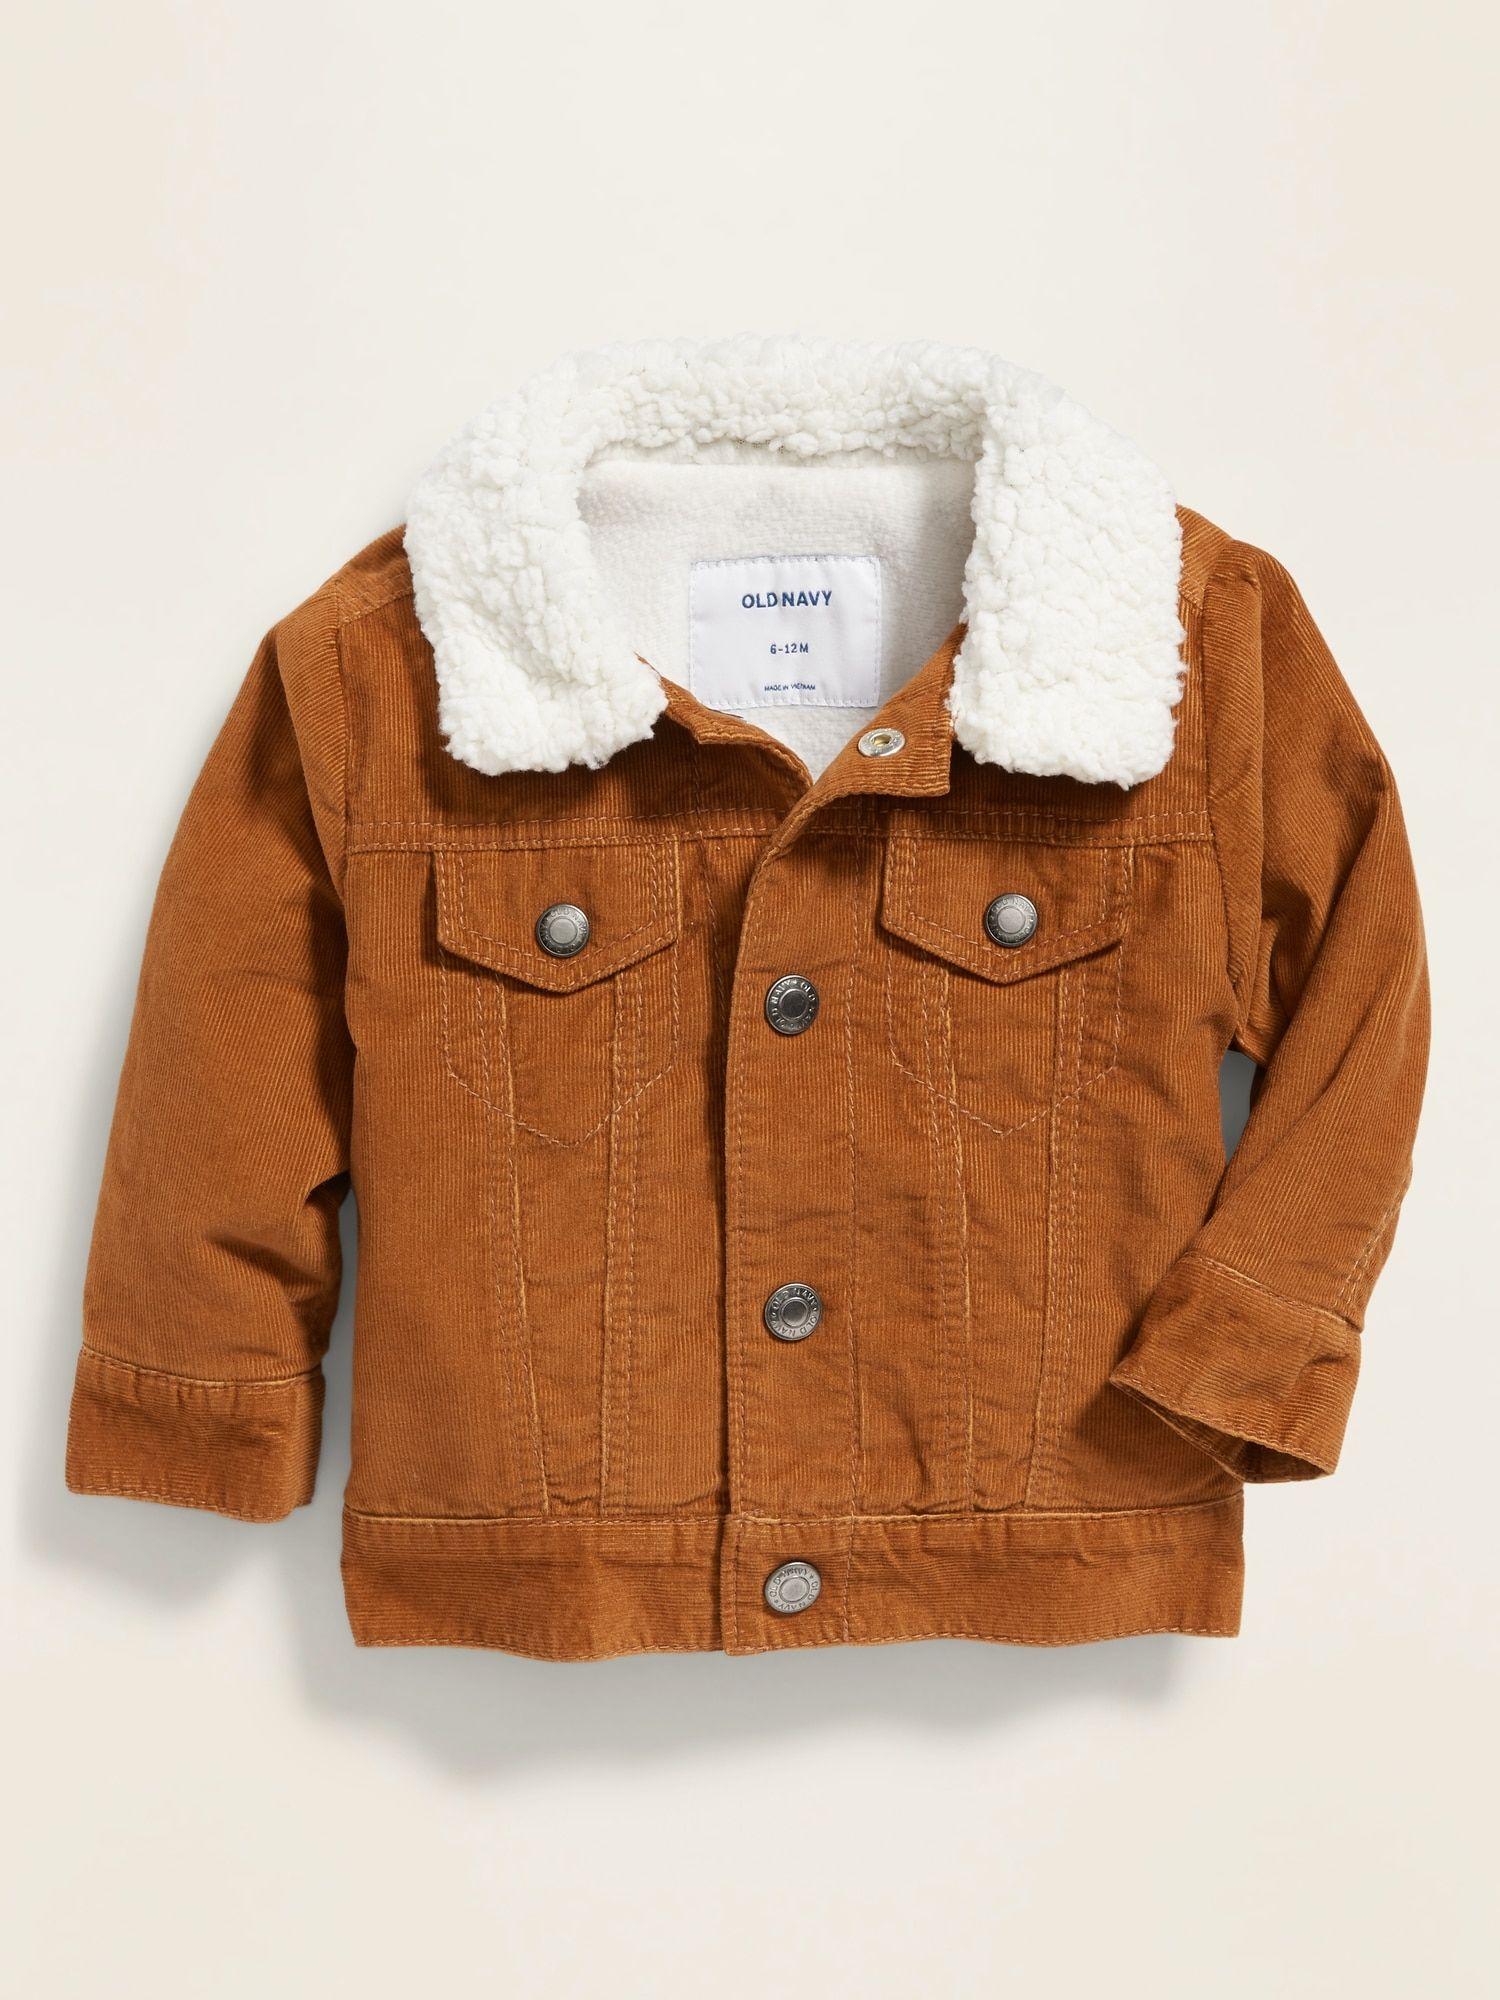 Corduroy Sherpa Collar Trucker Jacket For Baby Old Navy Baby Girl Jackets Girls Jacket Baby Boy Jackets [ 2000 x 1500 Pixel ]